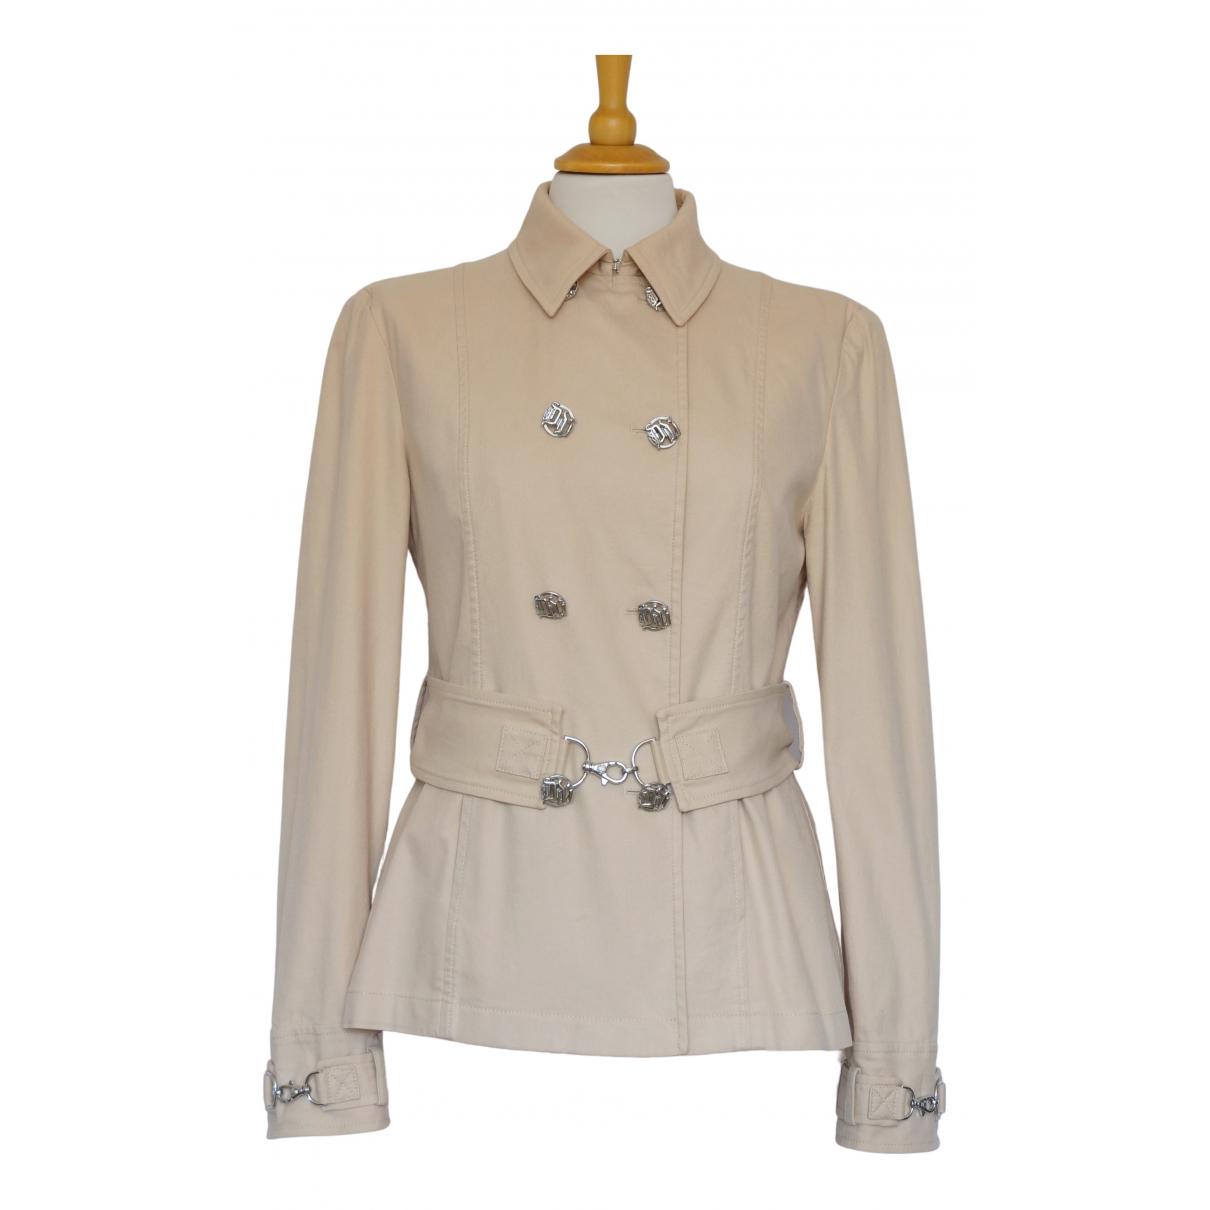 Gianni Versace \N Beige Cotton jacket for Women 8 UK